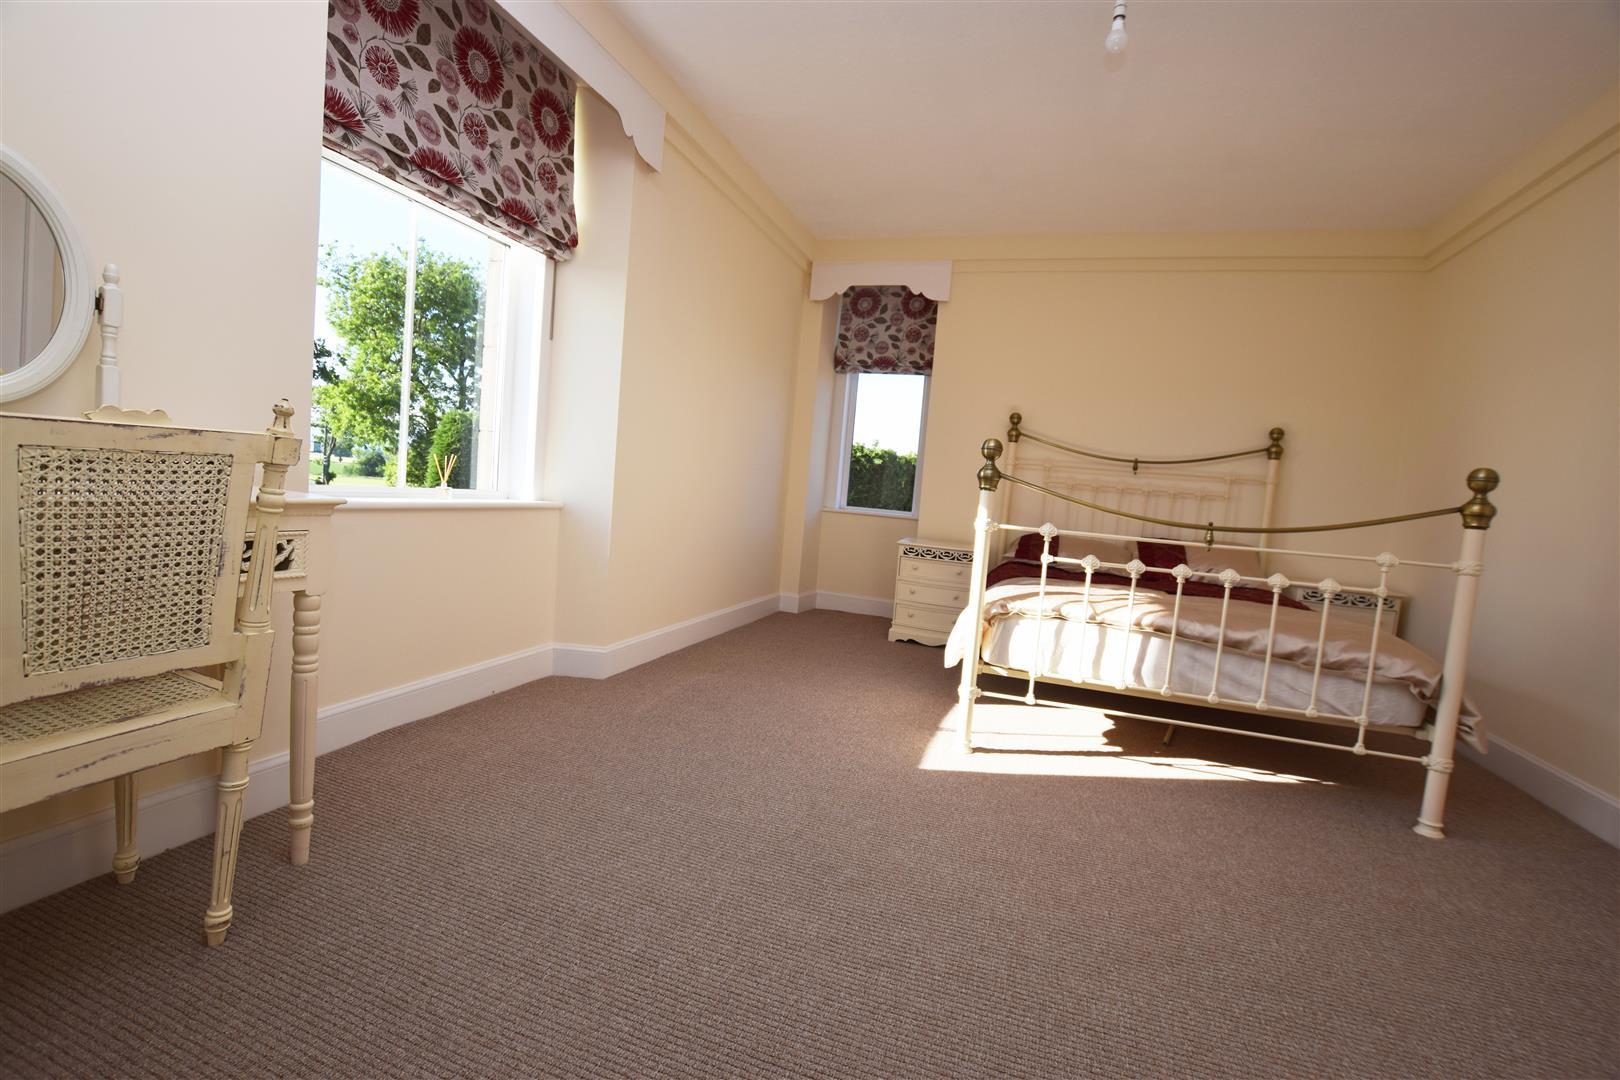 Denend Farmhouse, Newtyle, Blairgowrie, Angus, PH12 8SQ, UK